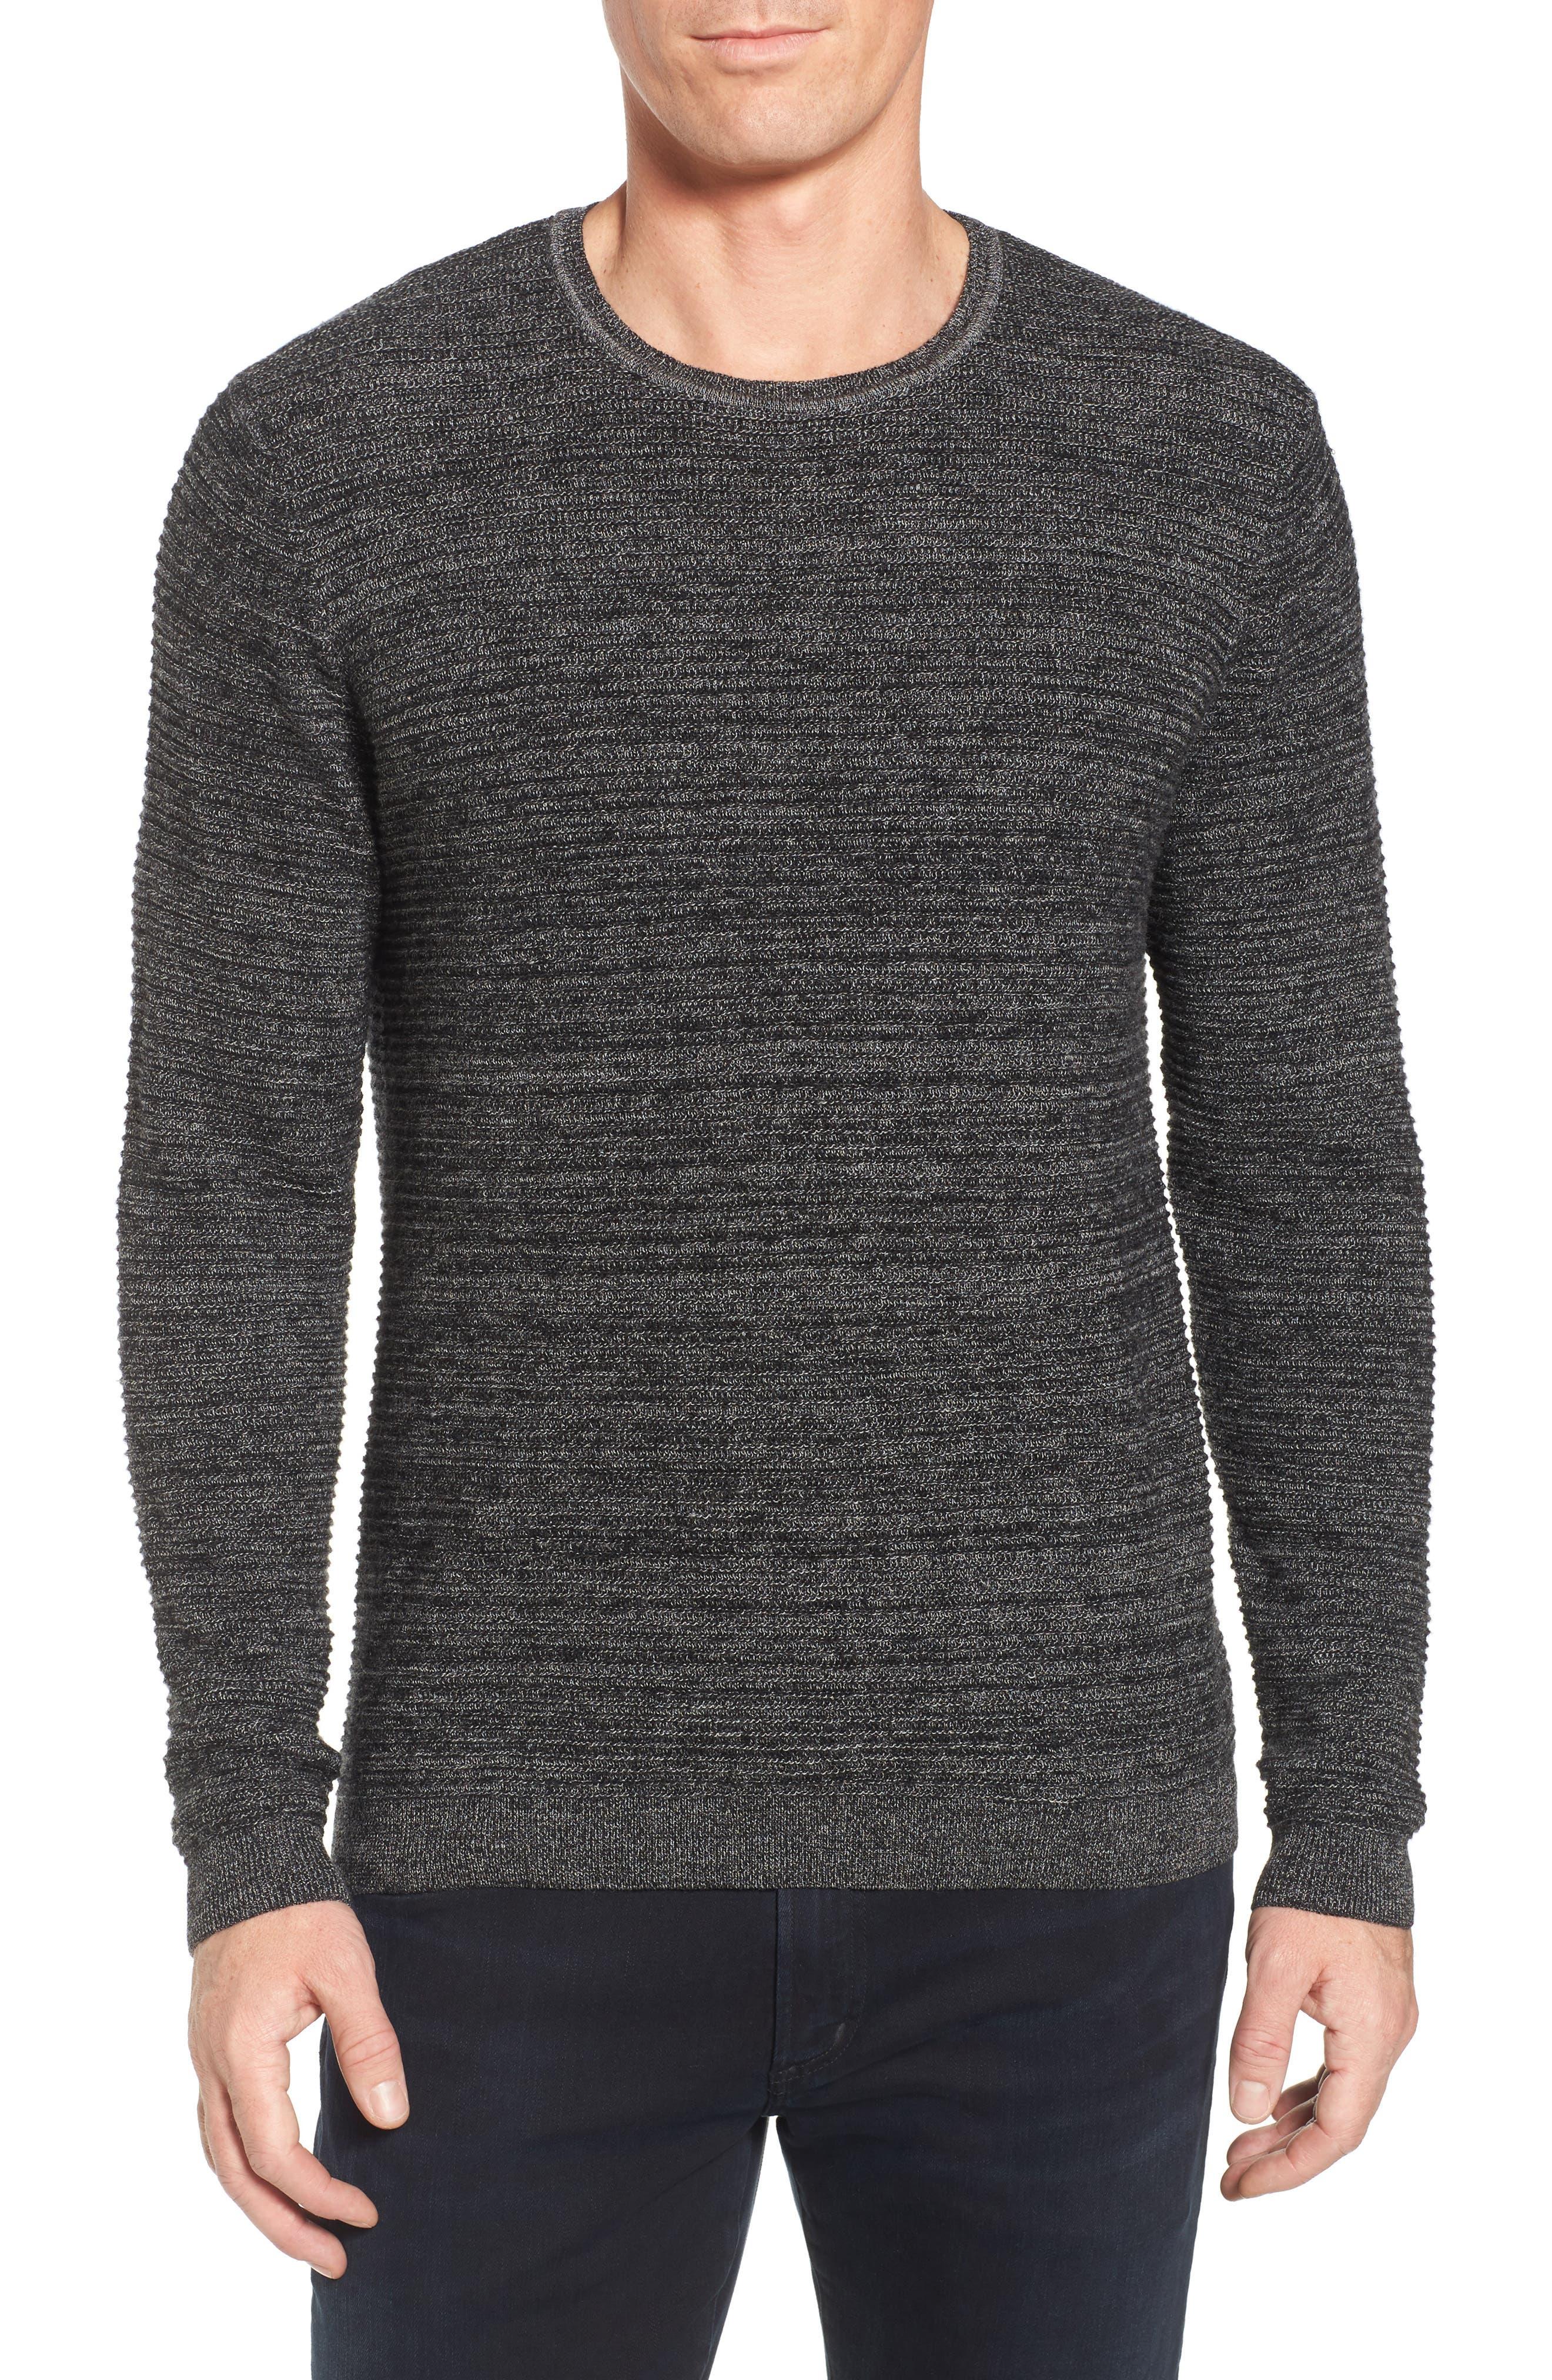 Ottoman Wool Blend Sweater,                         Main,                         color, Black Caviar Jaspe